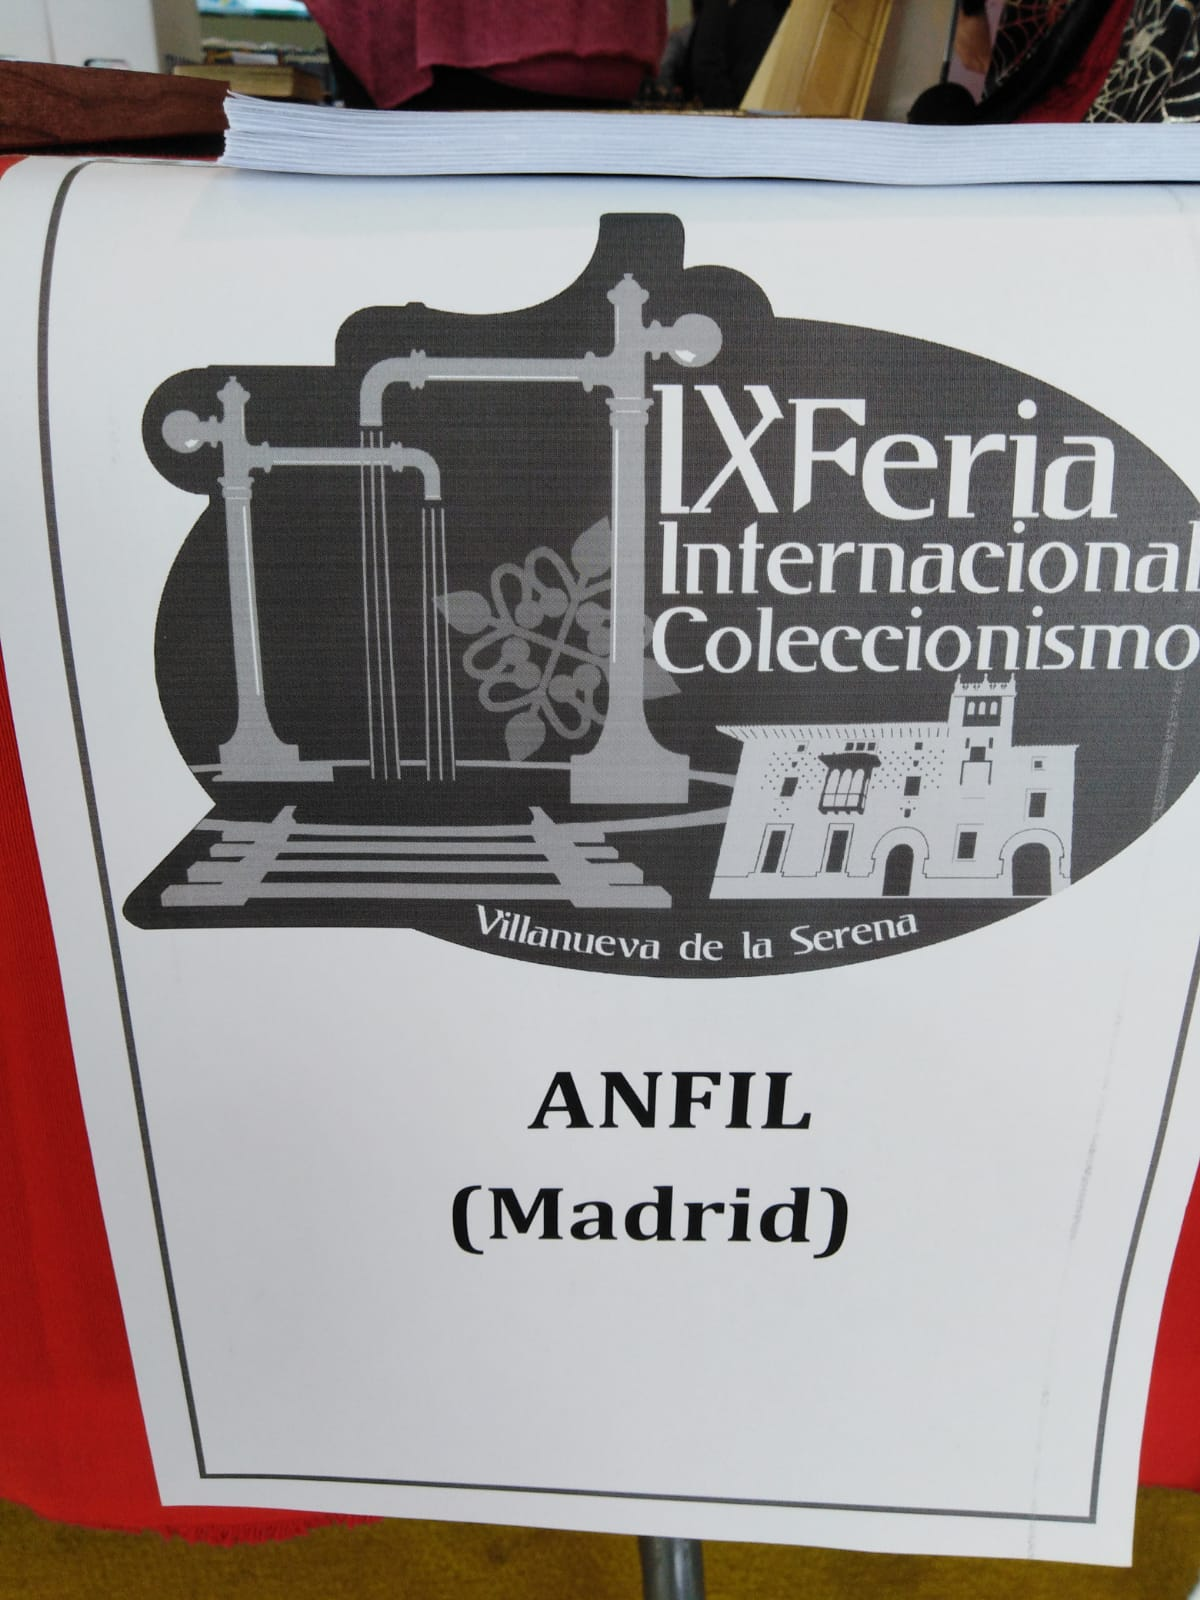 ANFIL PARTICIPA EN LA IX FERIA INTERNACIONAL DE COLECCIONISMO DE VILLANUEVA DE LA SERENA